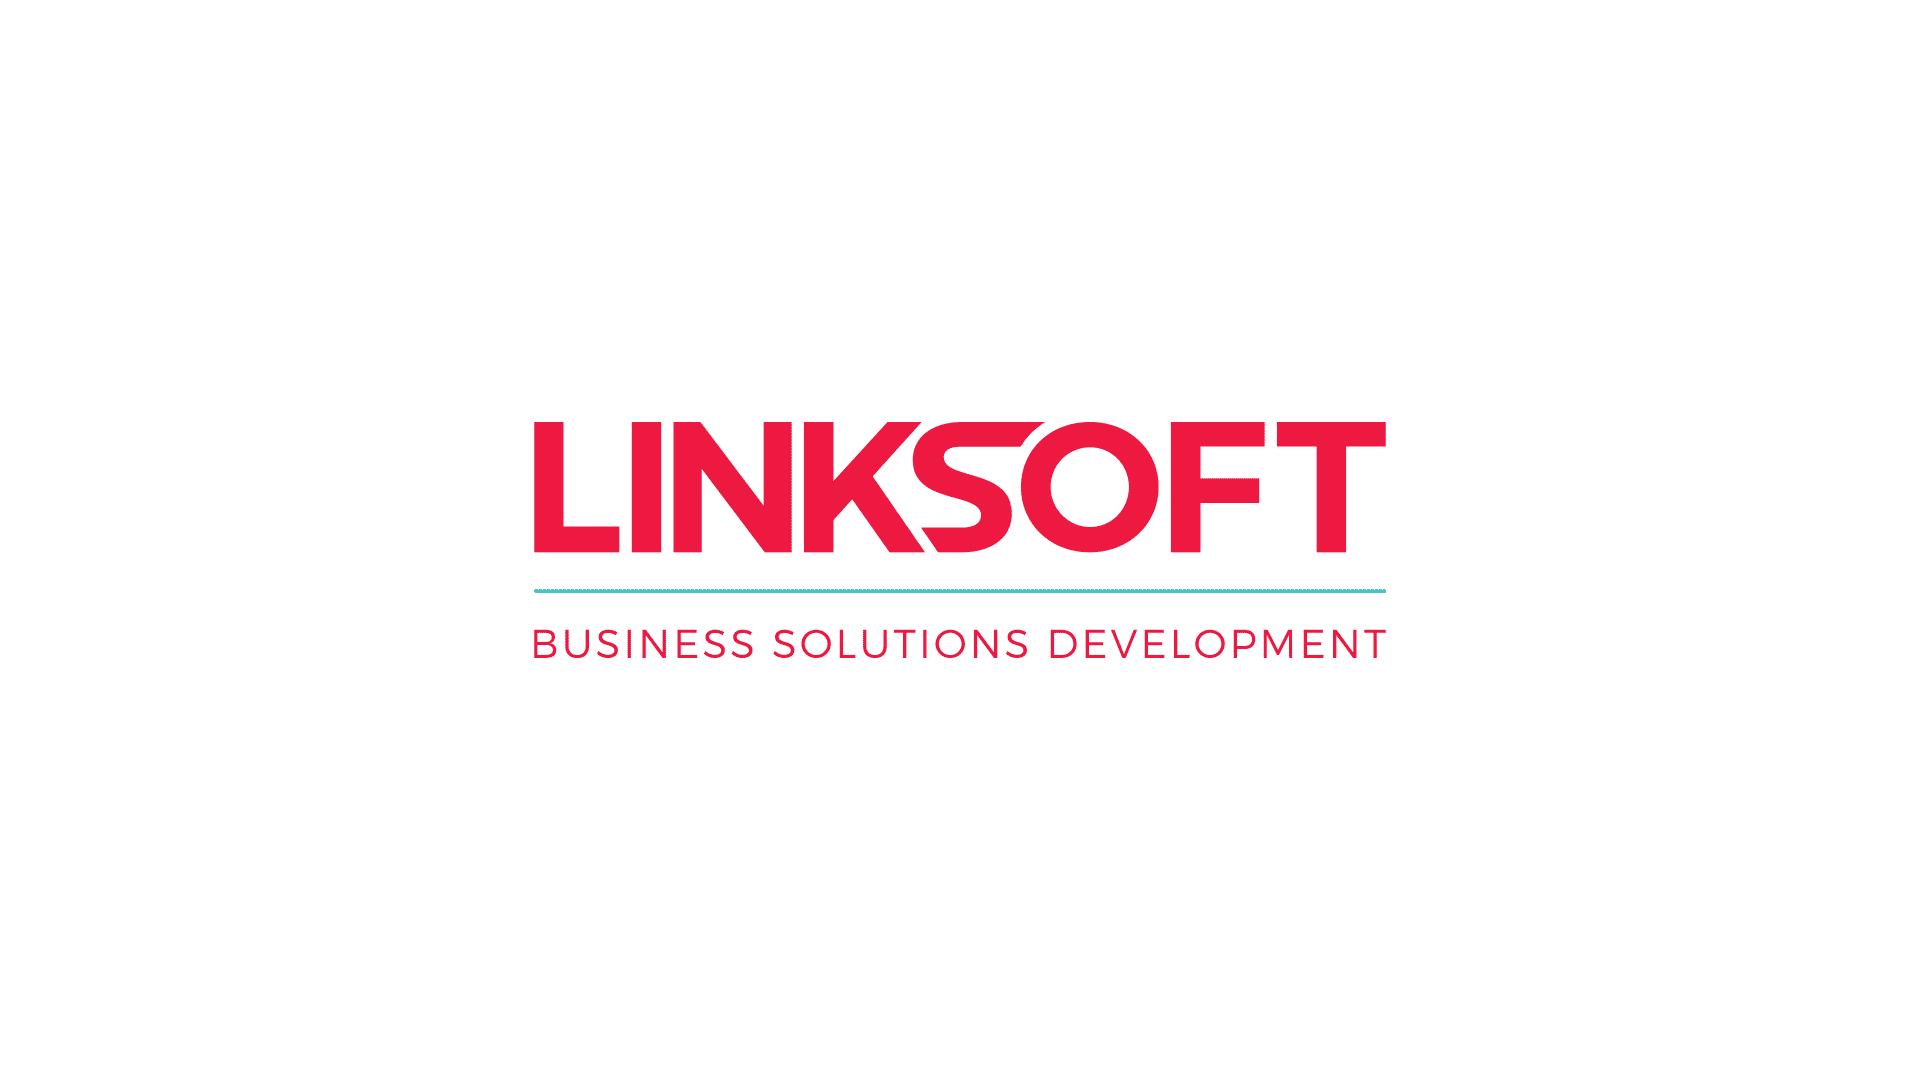 dezvoltare-identitate-vizuala-linksoft